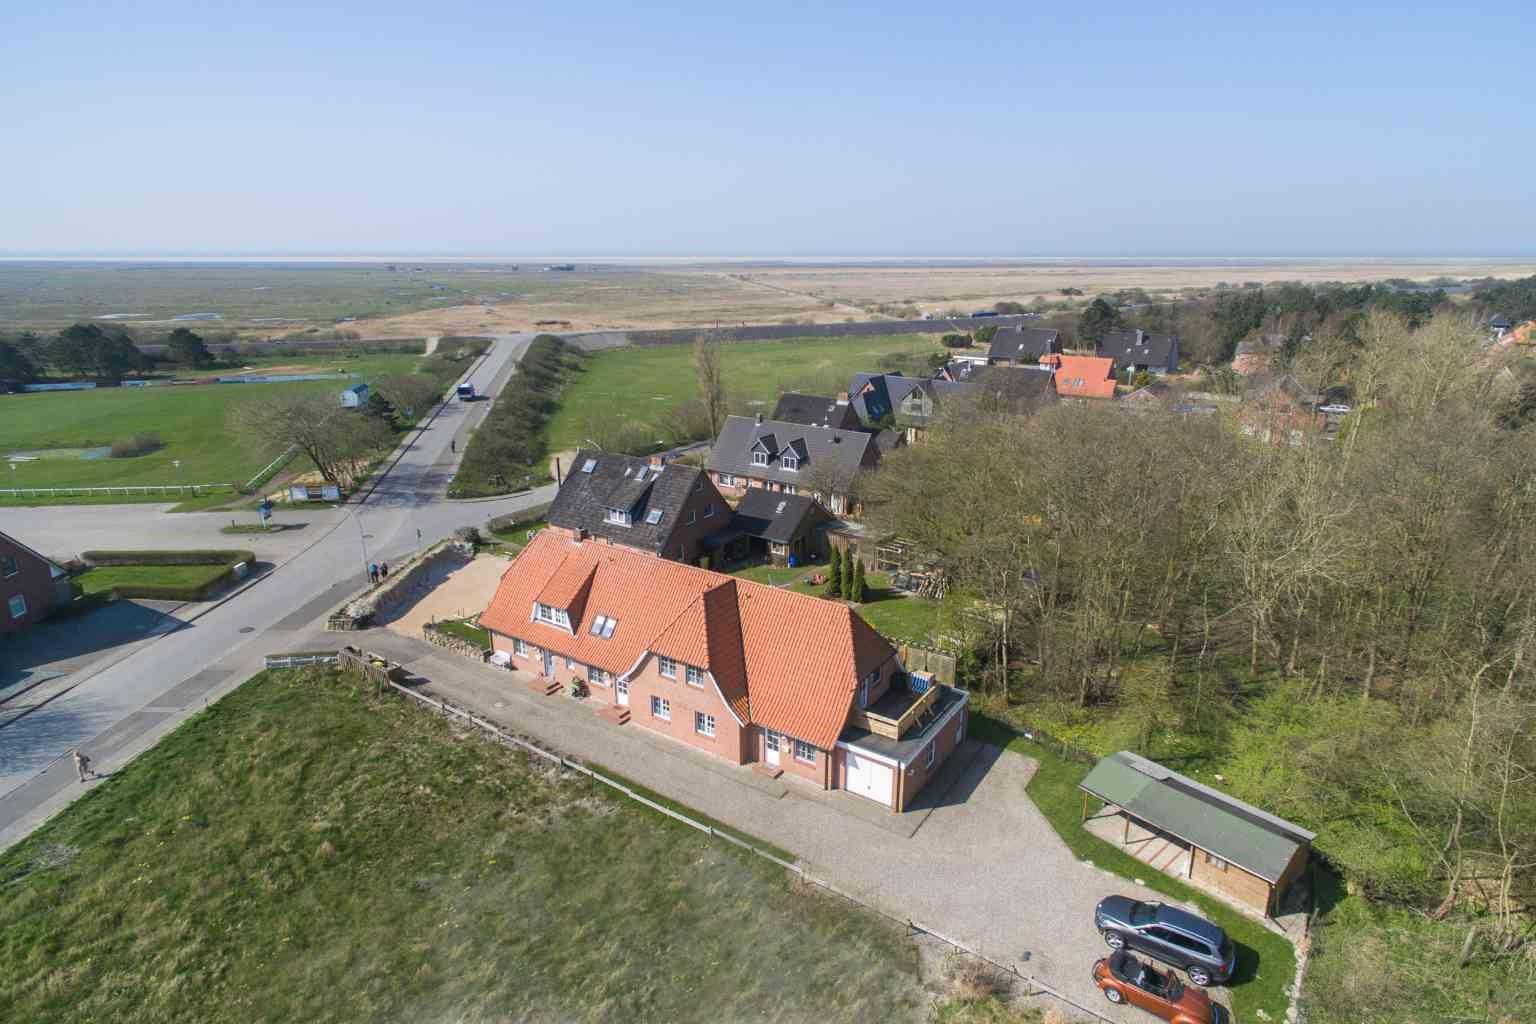 Luftbild mit Meerspanorama Haus Paulsen, St. Peter-Dorf